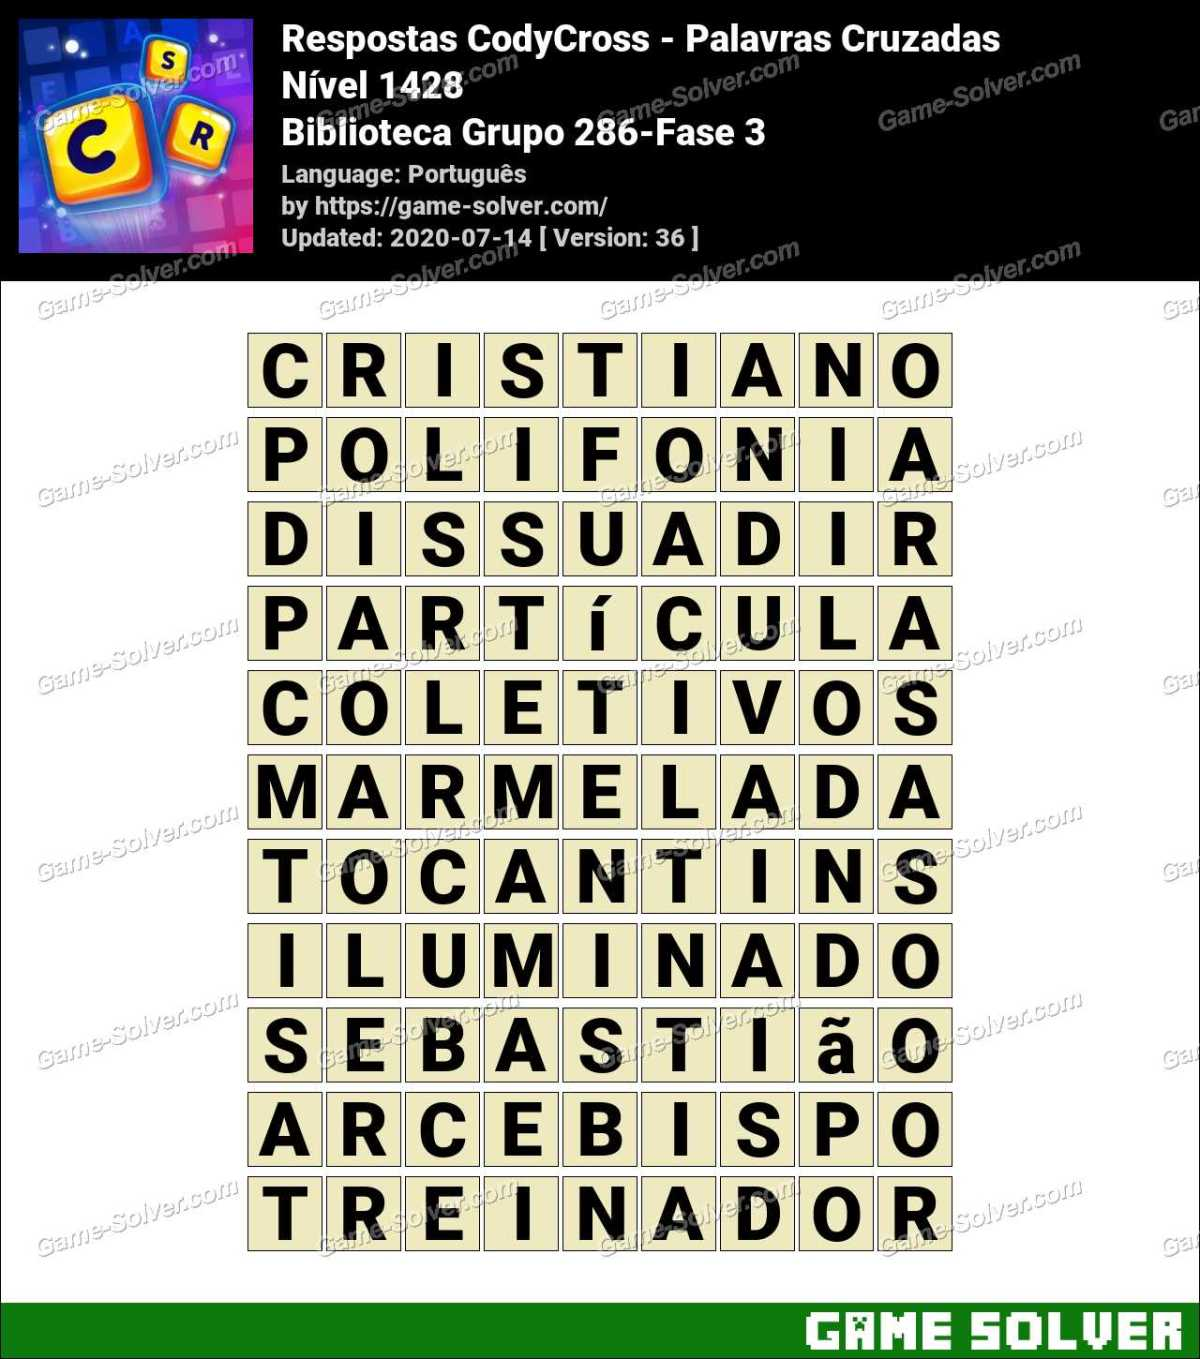 Respostas CodyCross Biblioteca Grupo 286-Fase 3